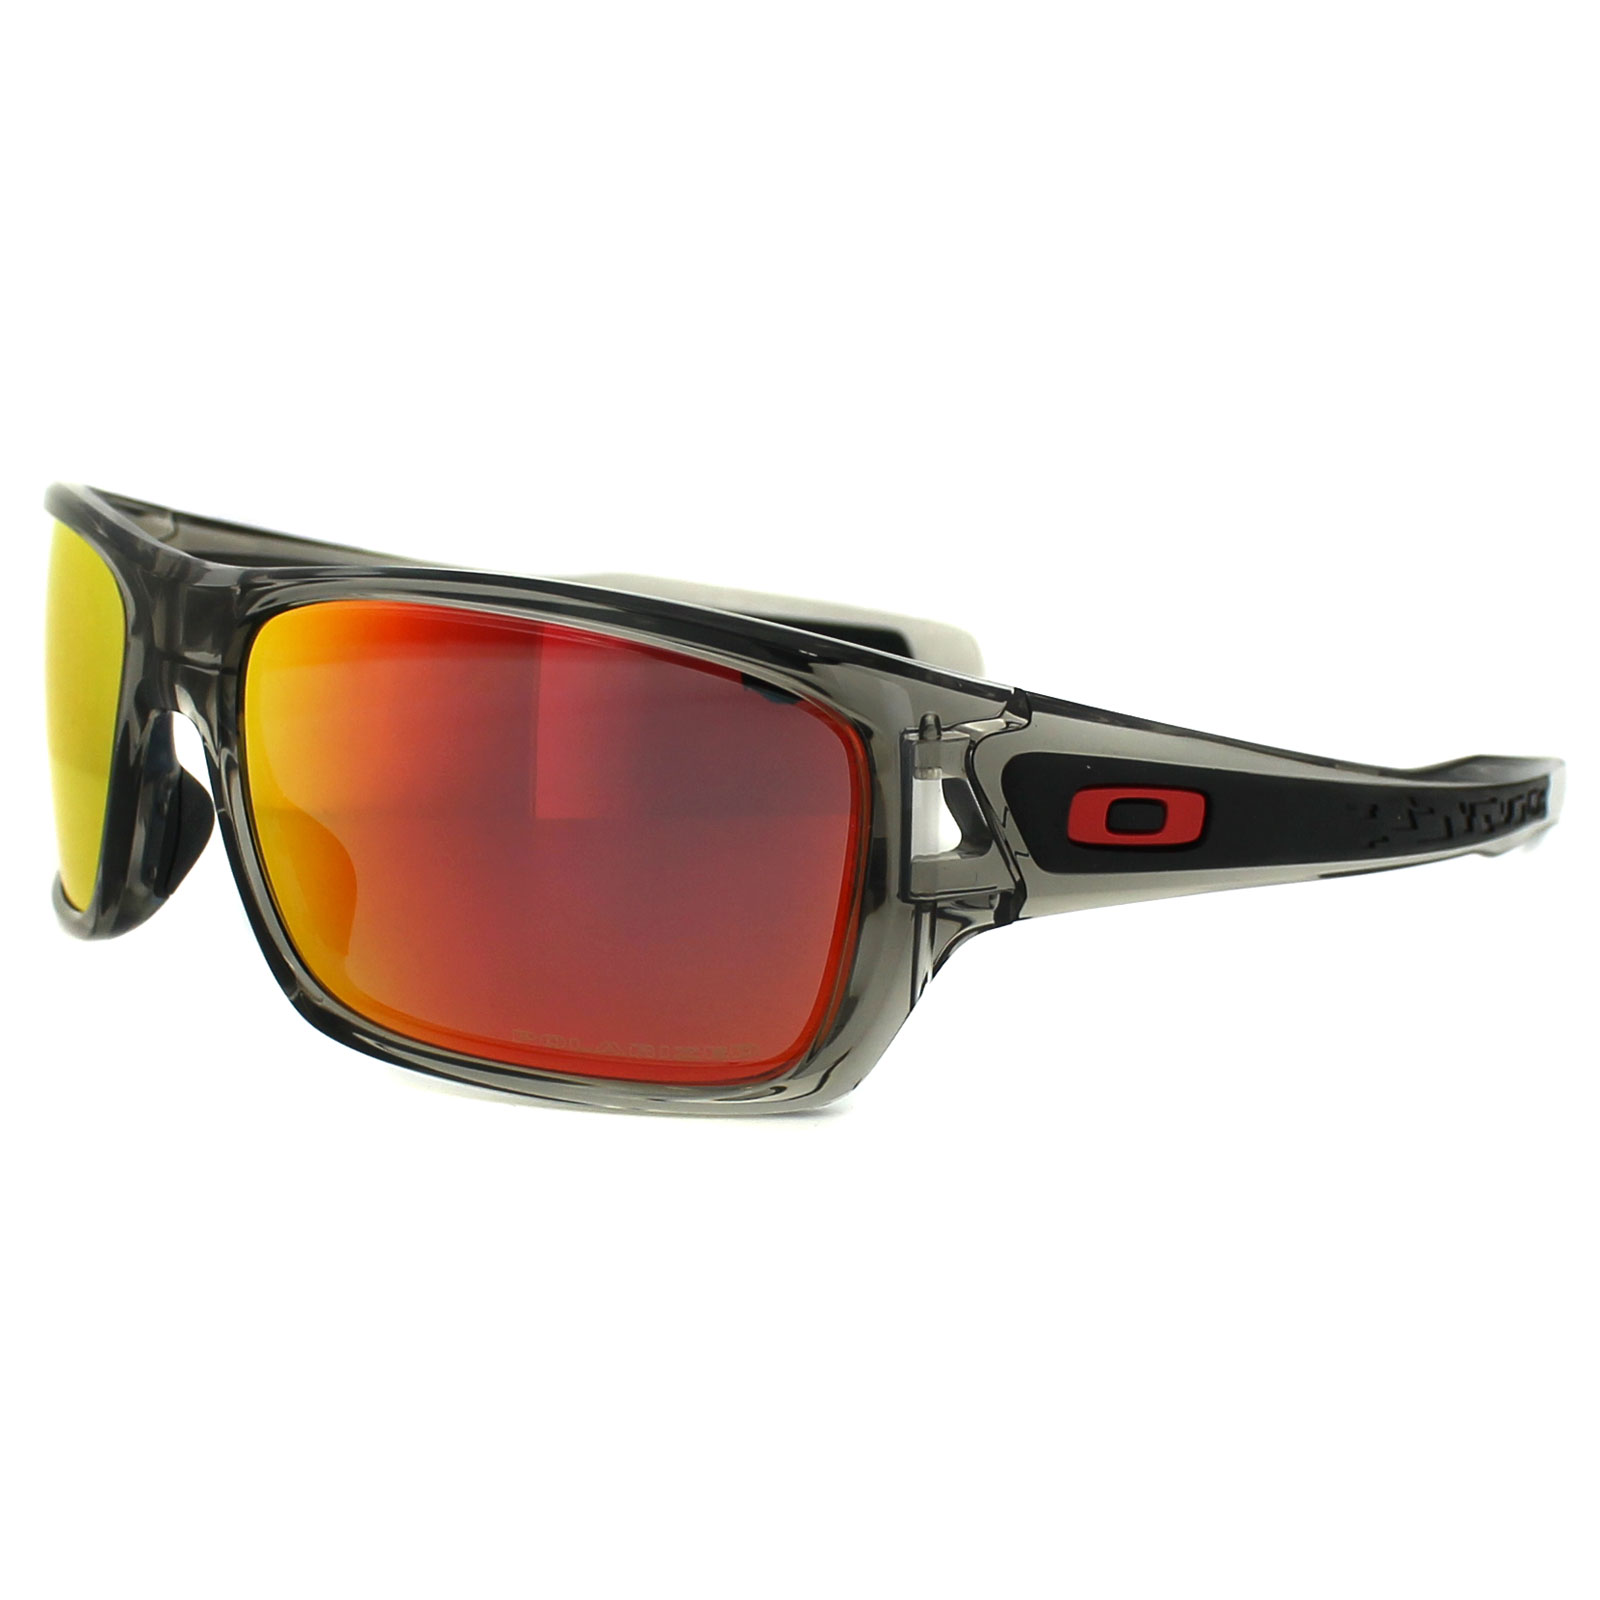 40bb73c310790 Details about Oakley Sunglasses Turbine OO9263-10 Grey Ink Ruby Iridium  Polarized